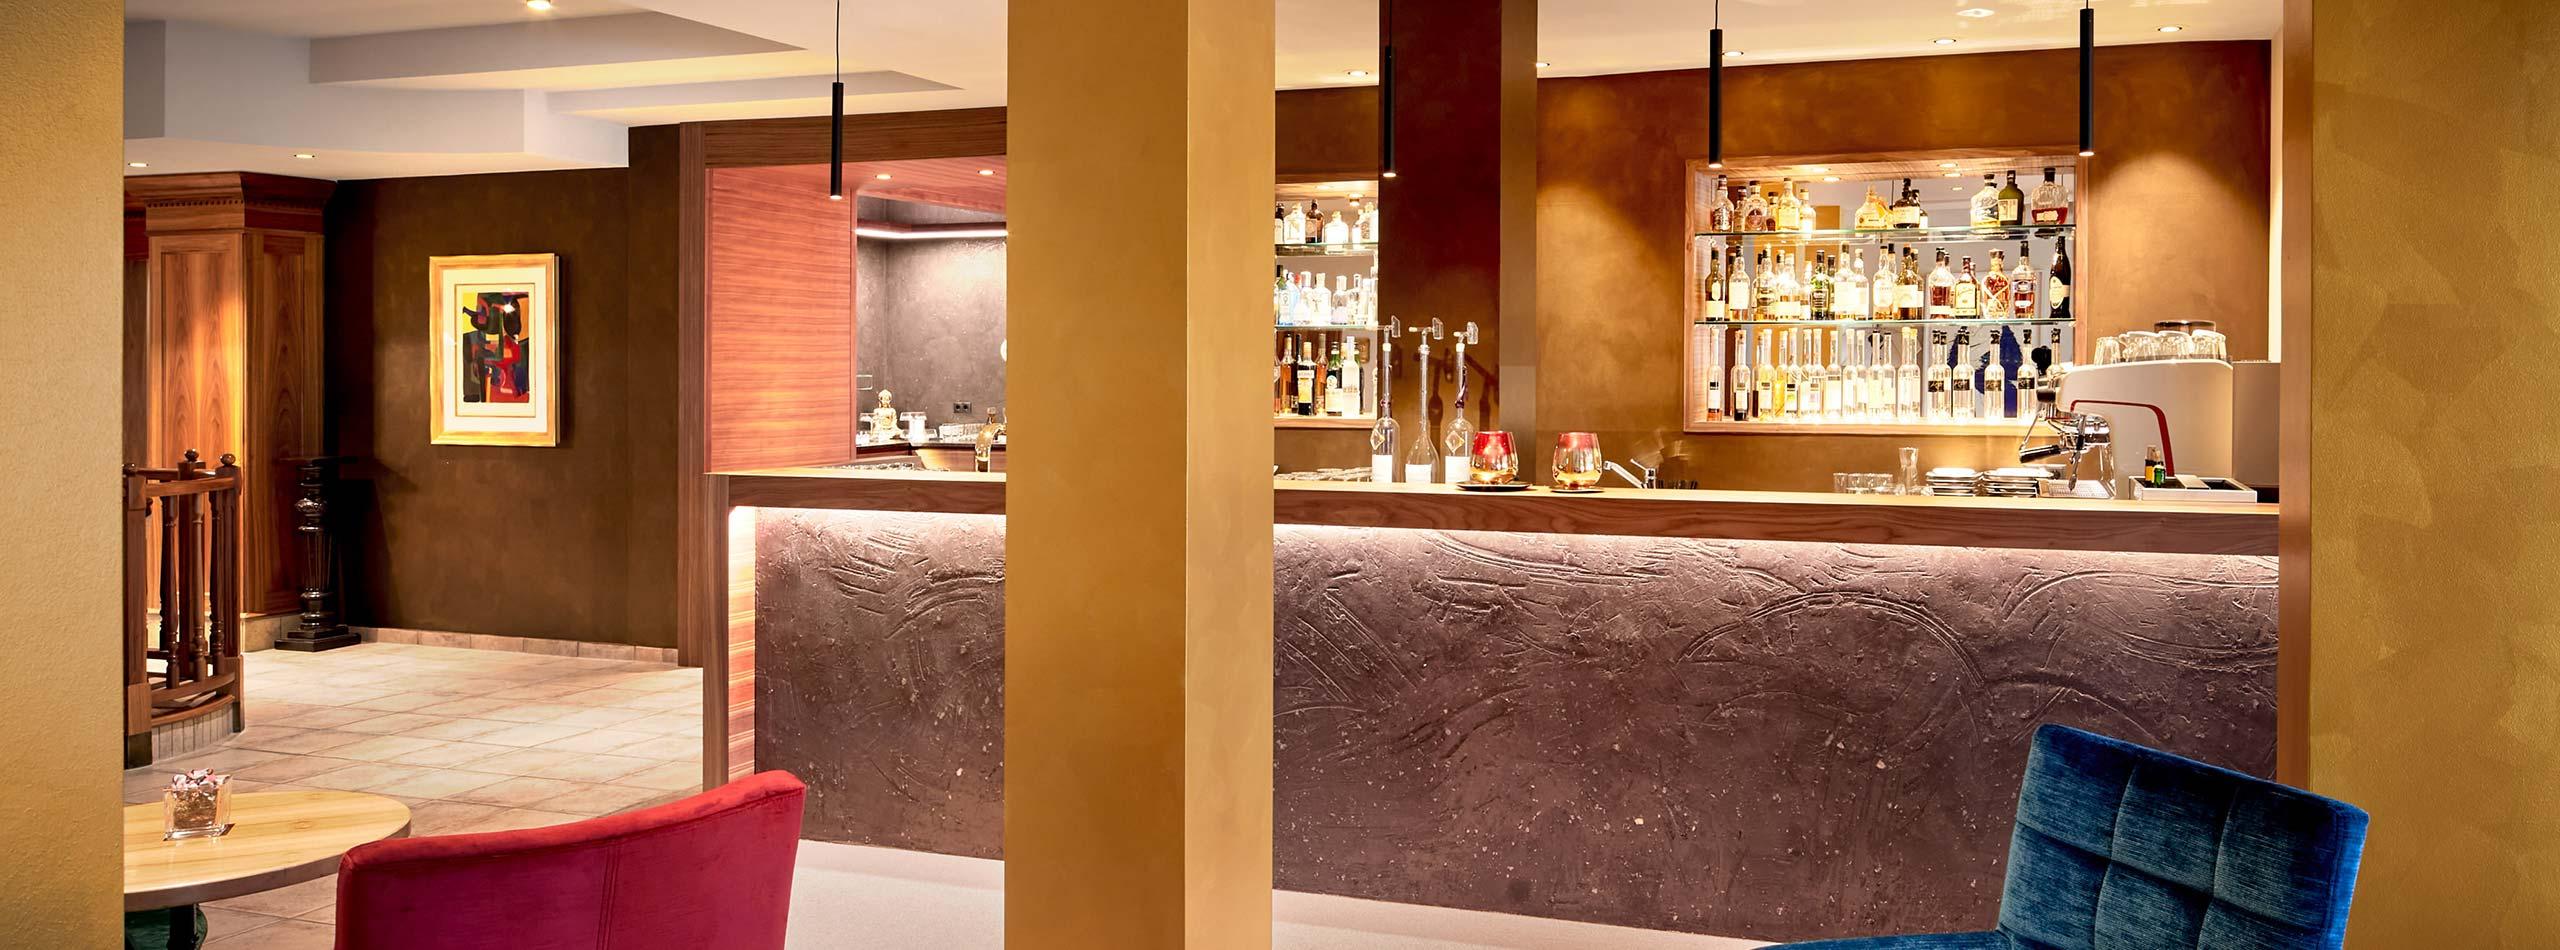 Bar & Lounge im Ayurveda Resort Bad Waltersdorf Steiermark